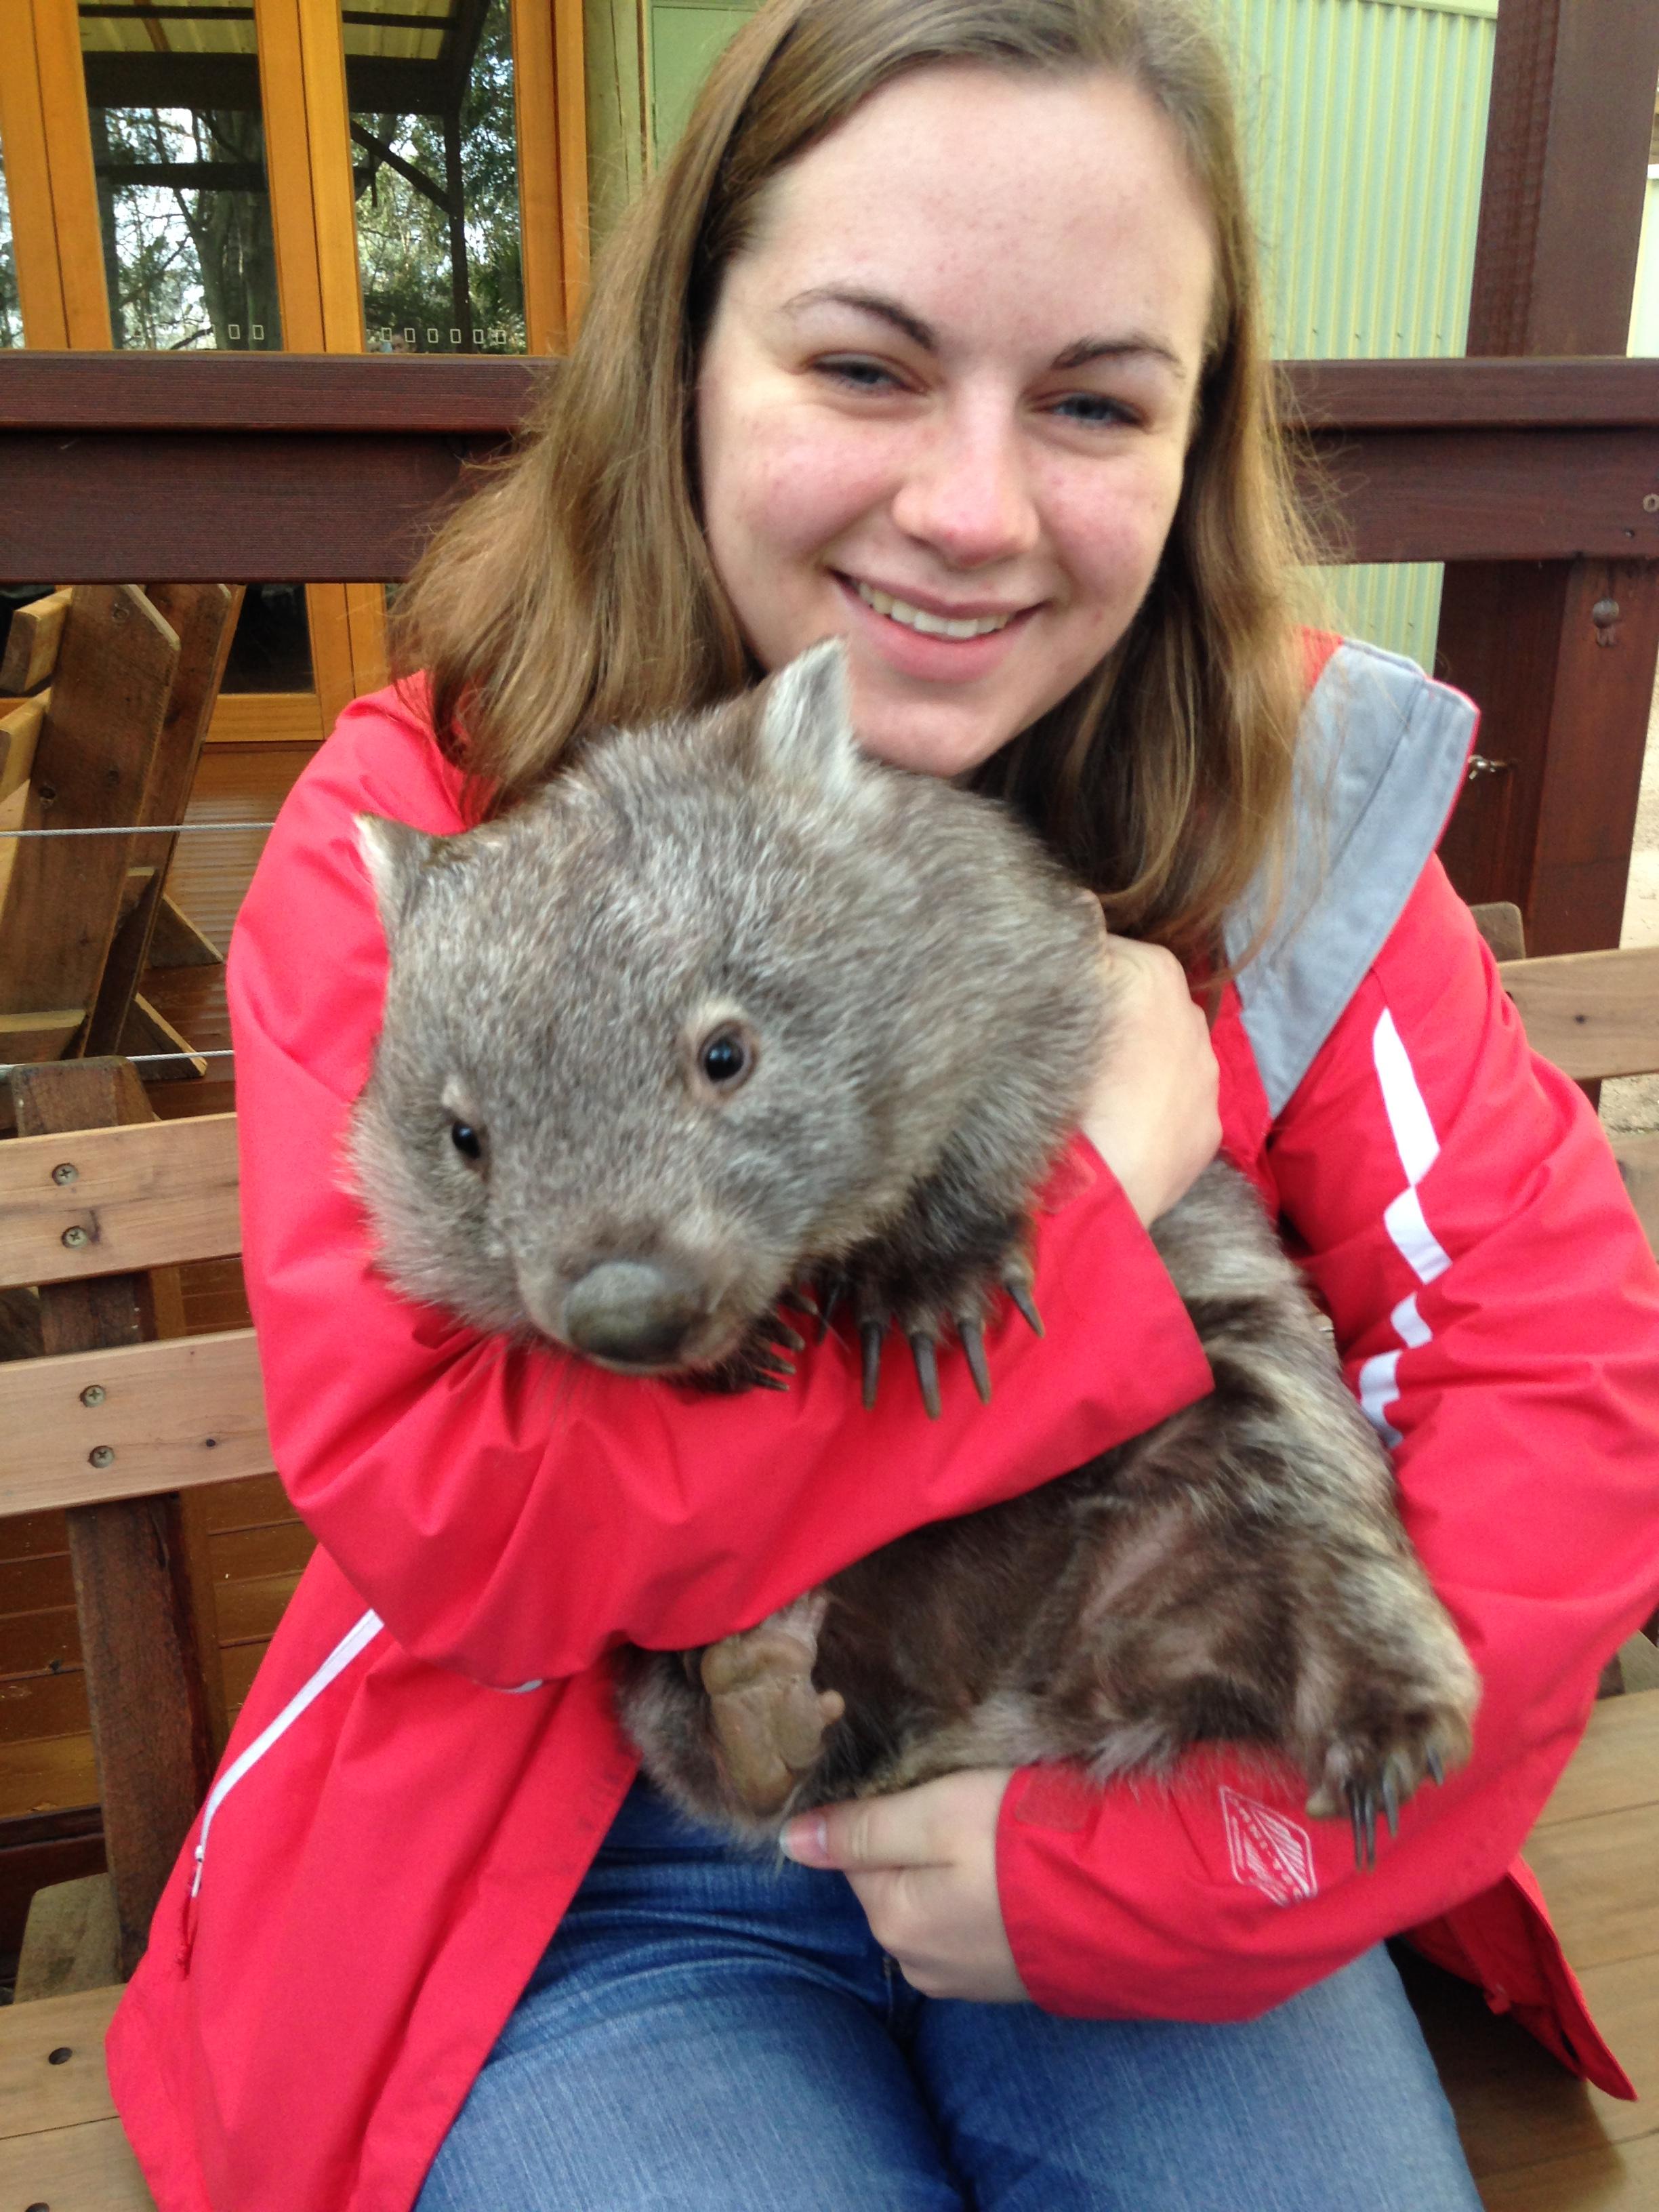 New Zealand Waikato- Caroline Blazer Holding a baby wombat named Matilda in a wildlife park near Sydney, Australia.